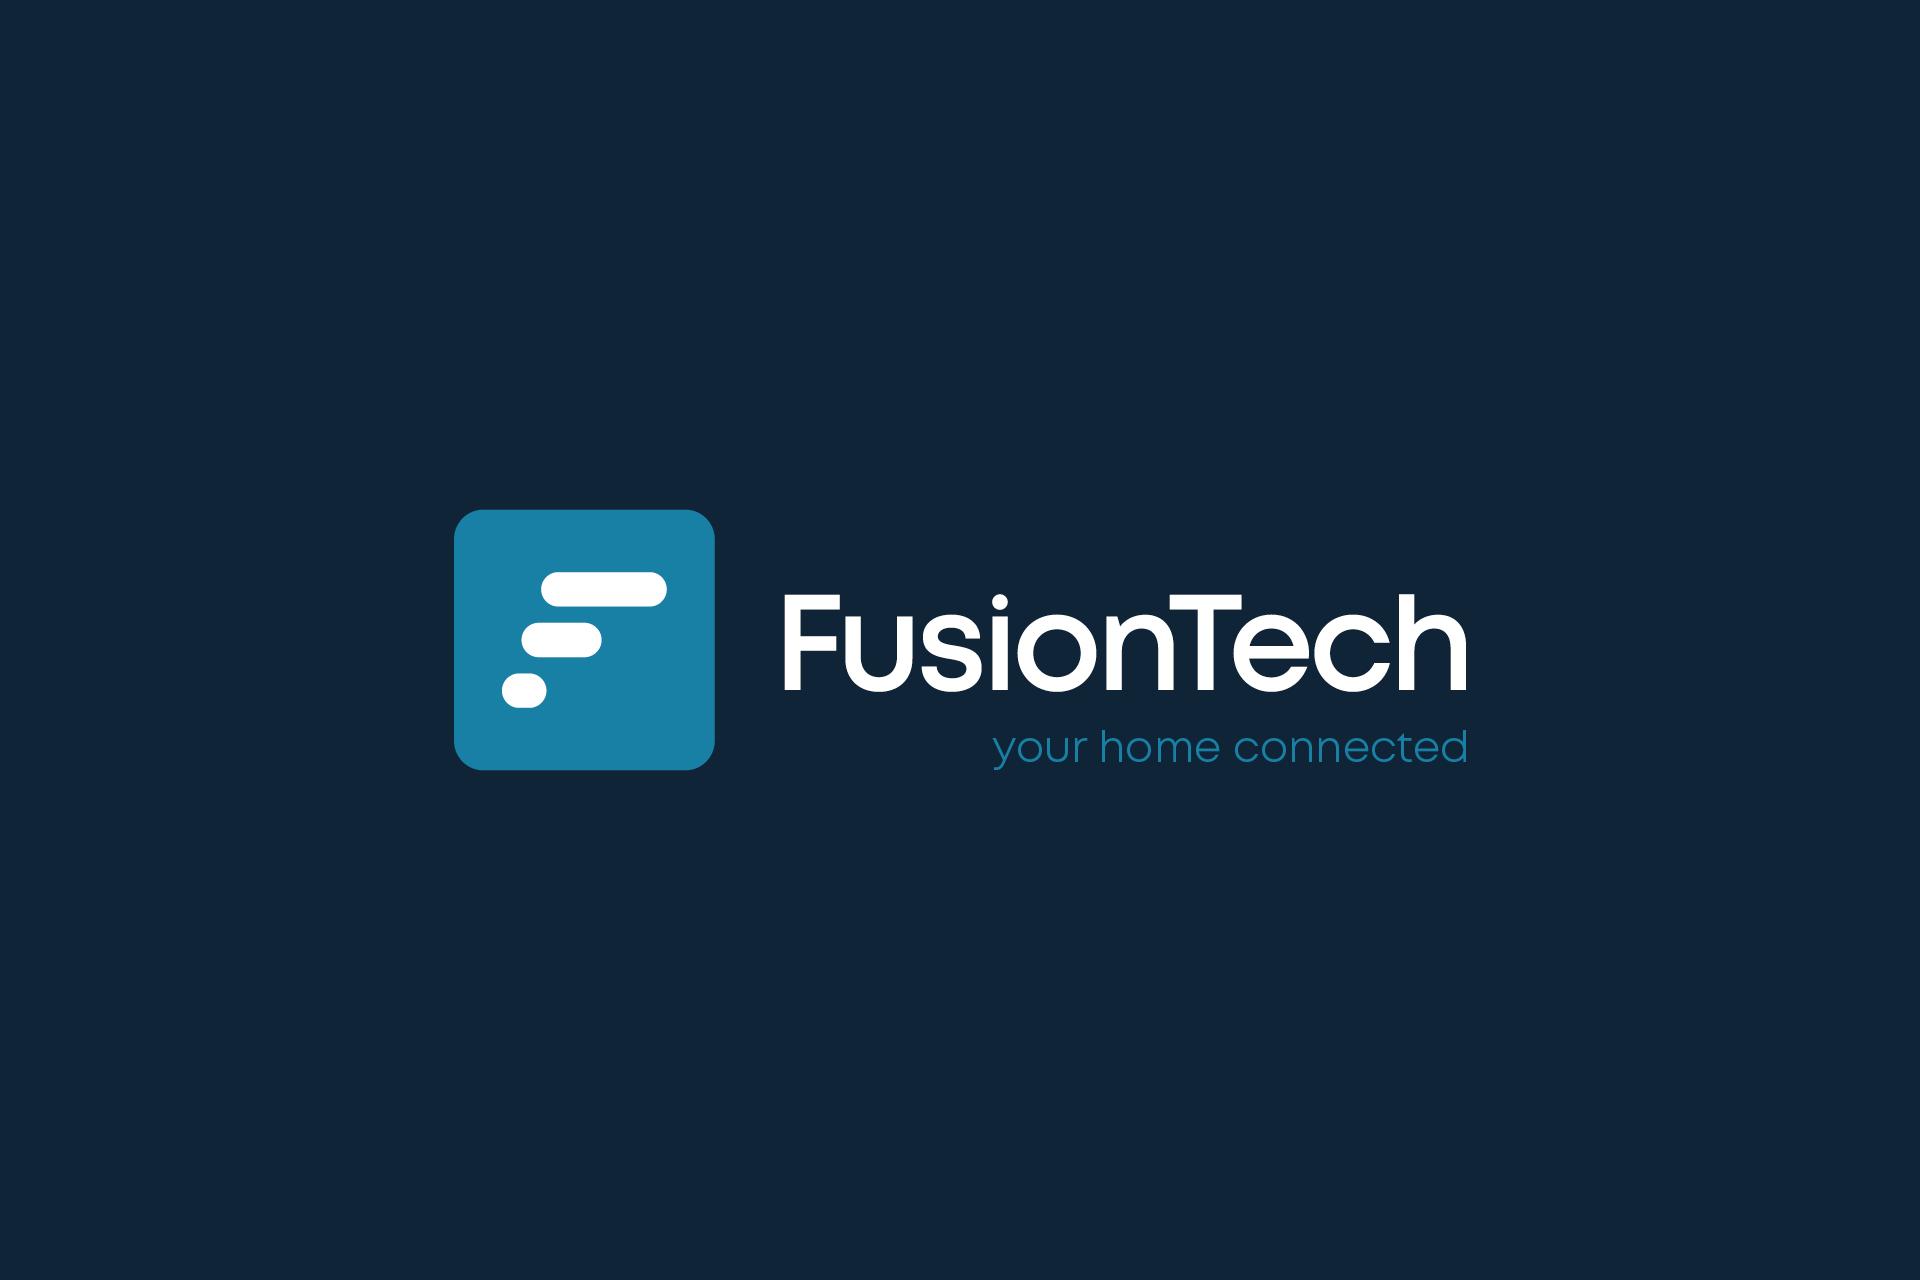 GCD_FusionTech